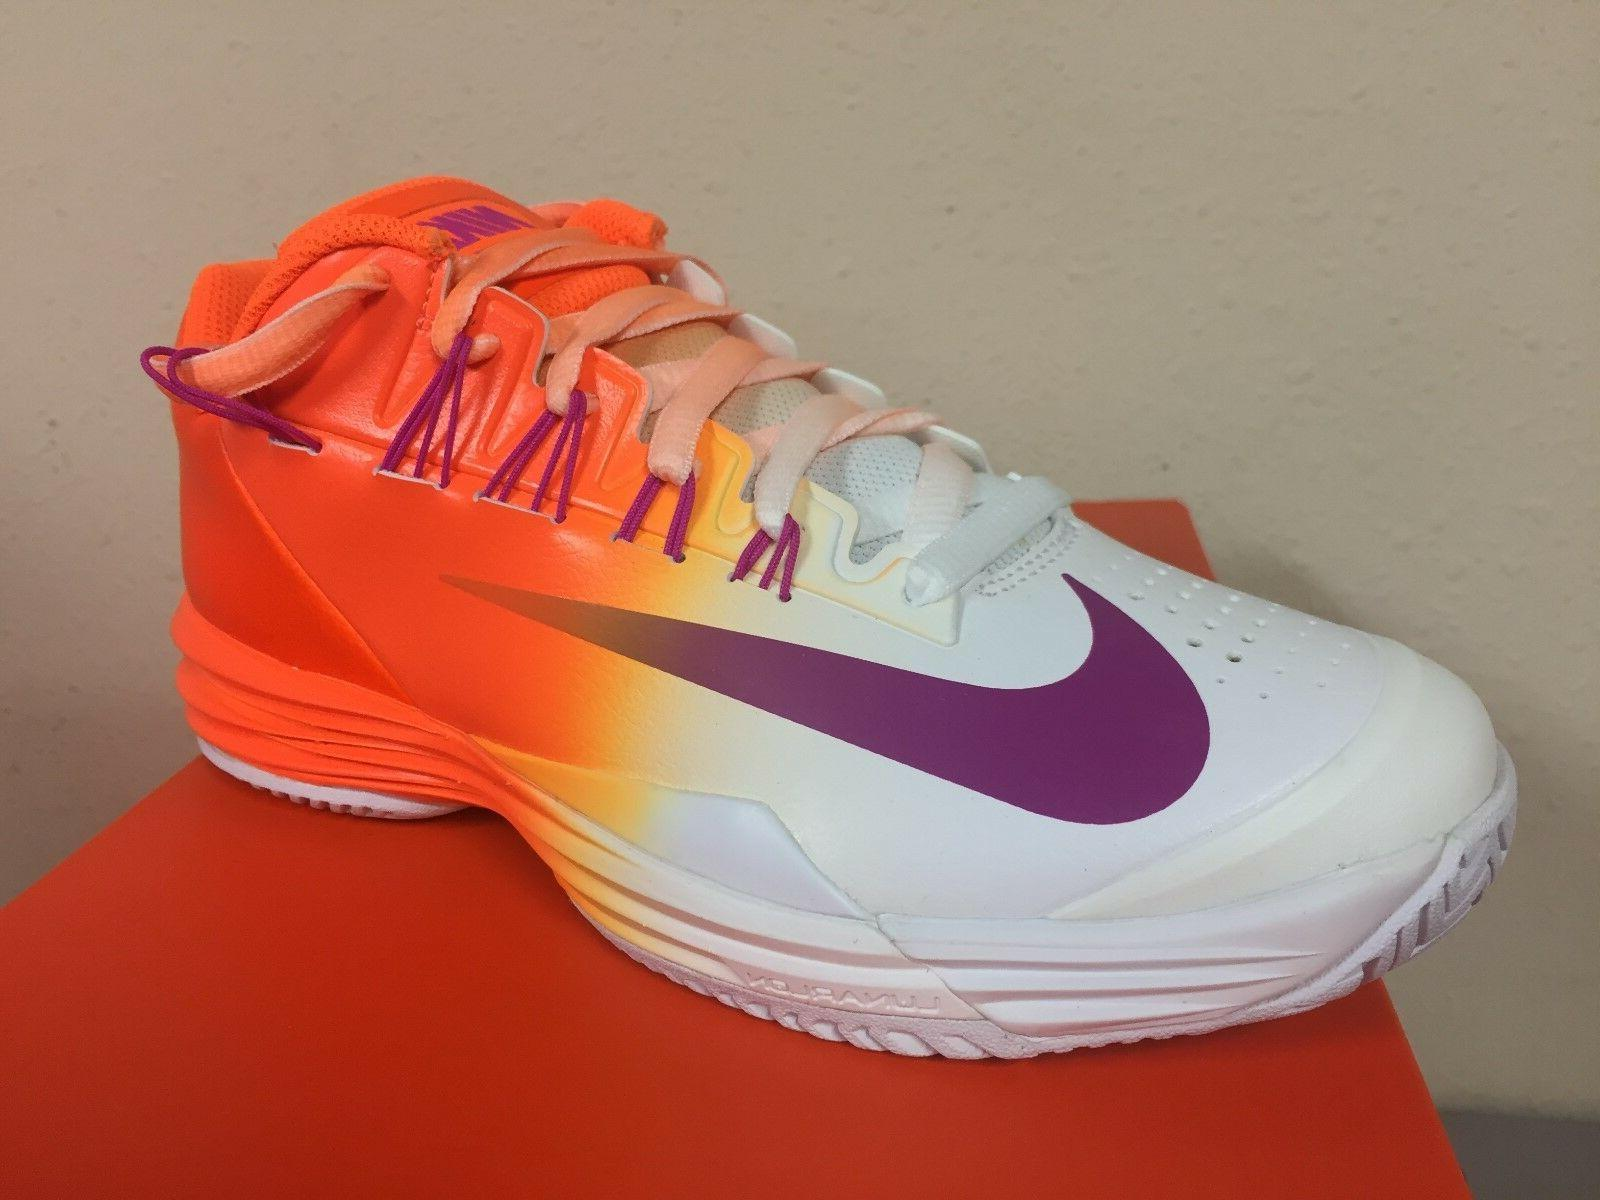 Nike Men's Lunar Ballistec 1.5 Tennis Shoes Style 705285 800